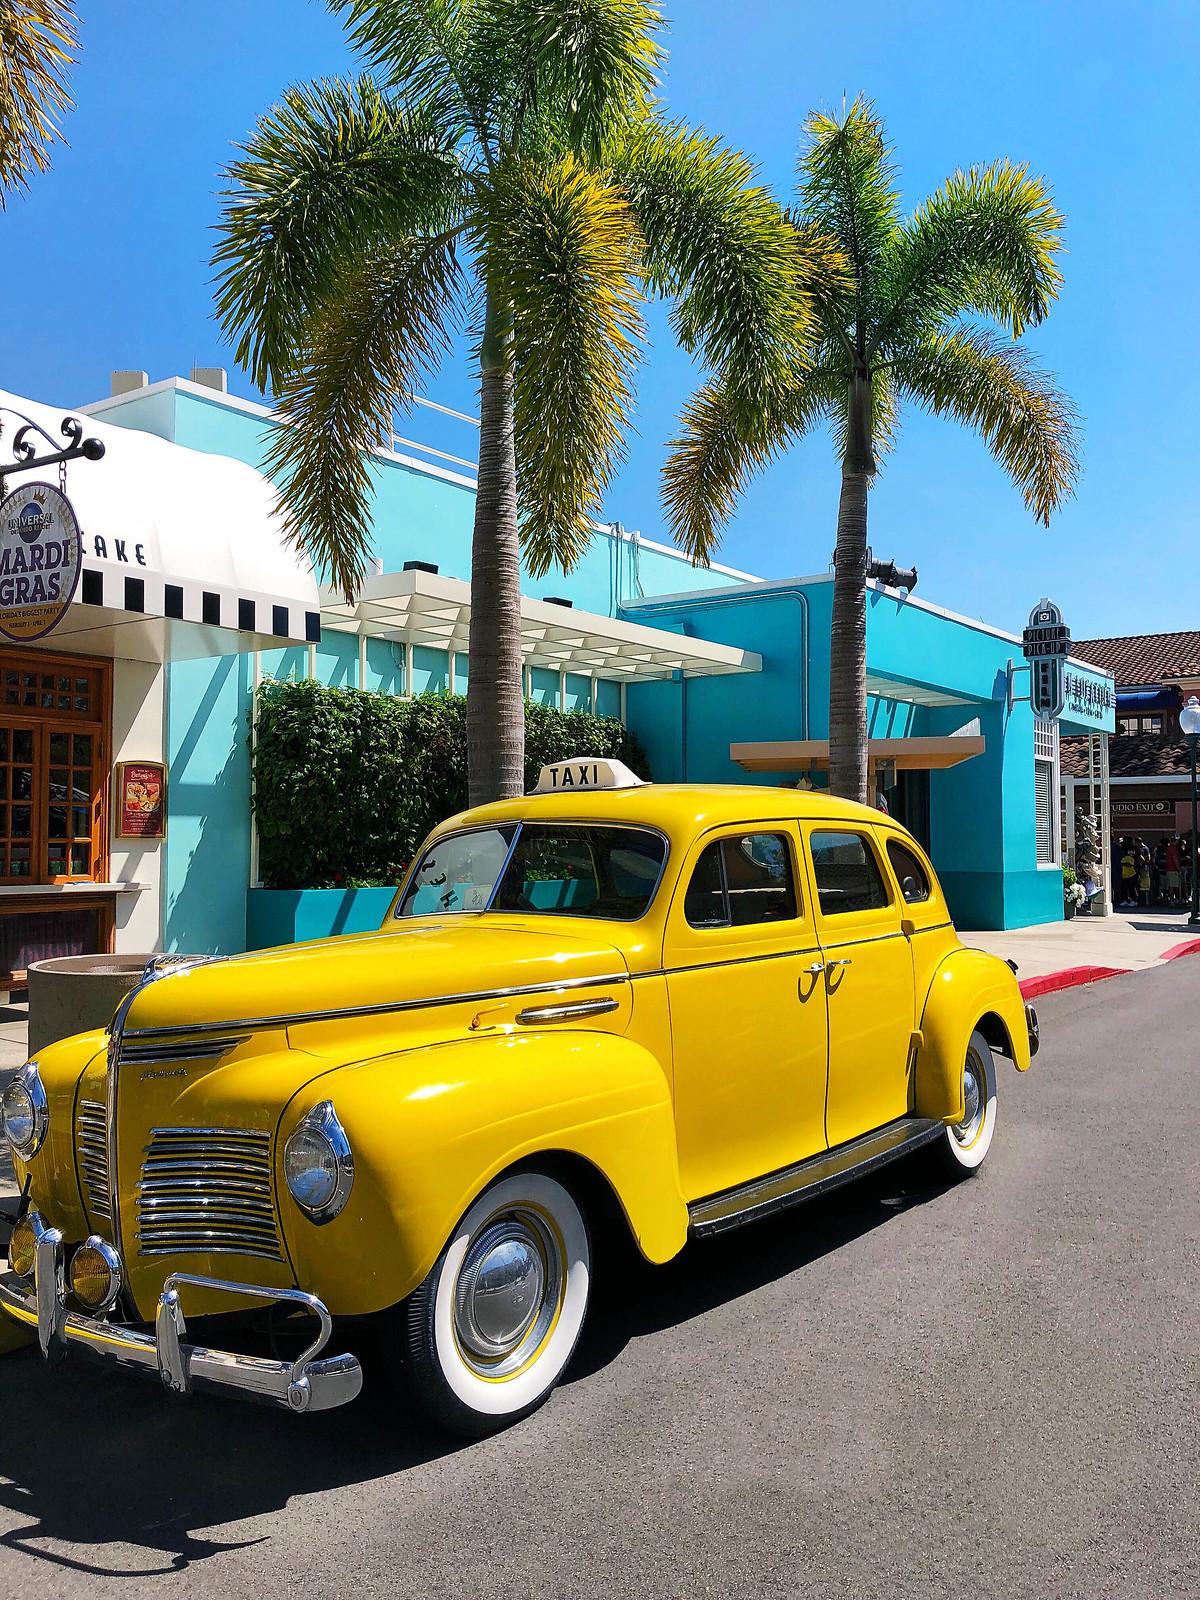 Vintage Old Yellow Cab Universal Studios Florida